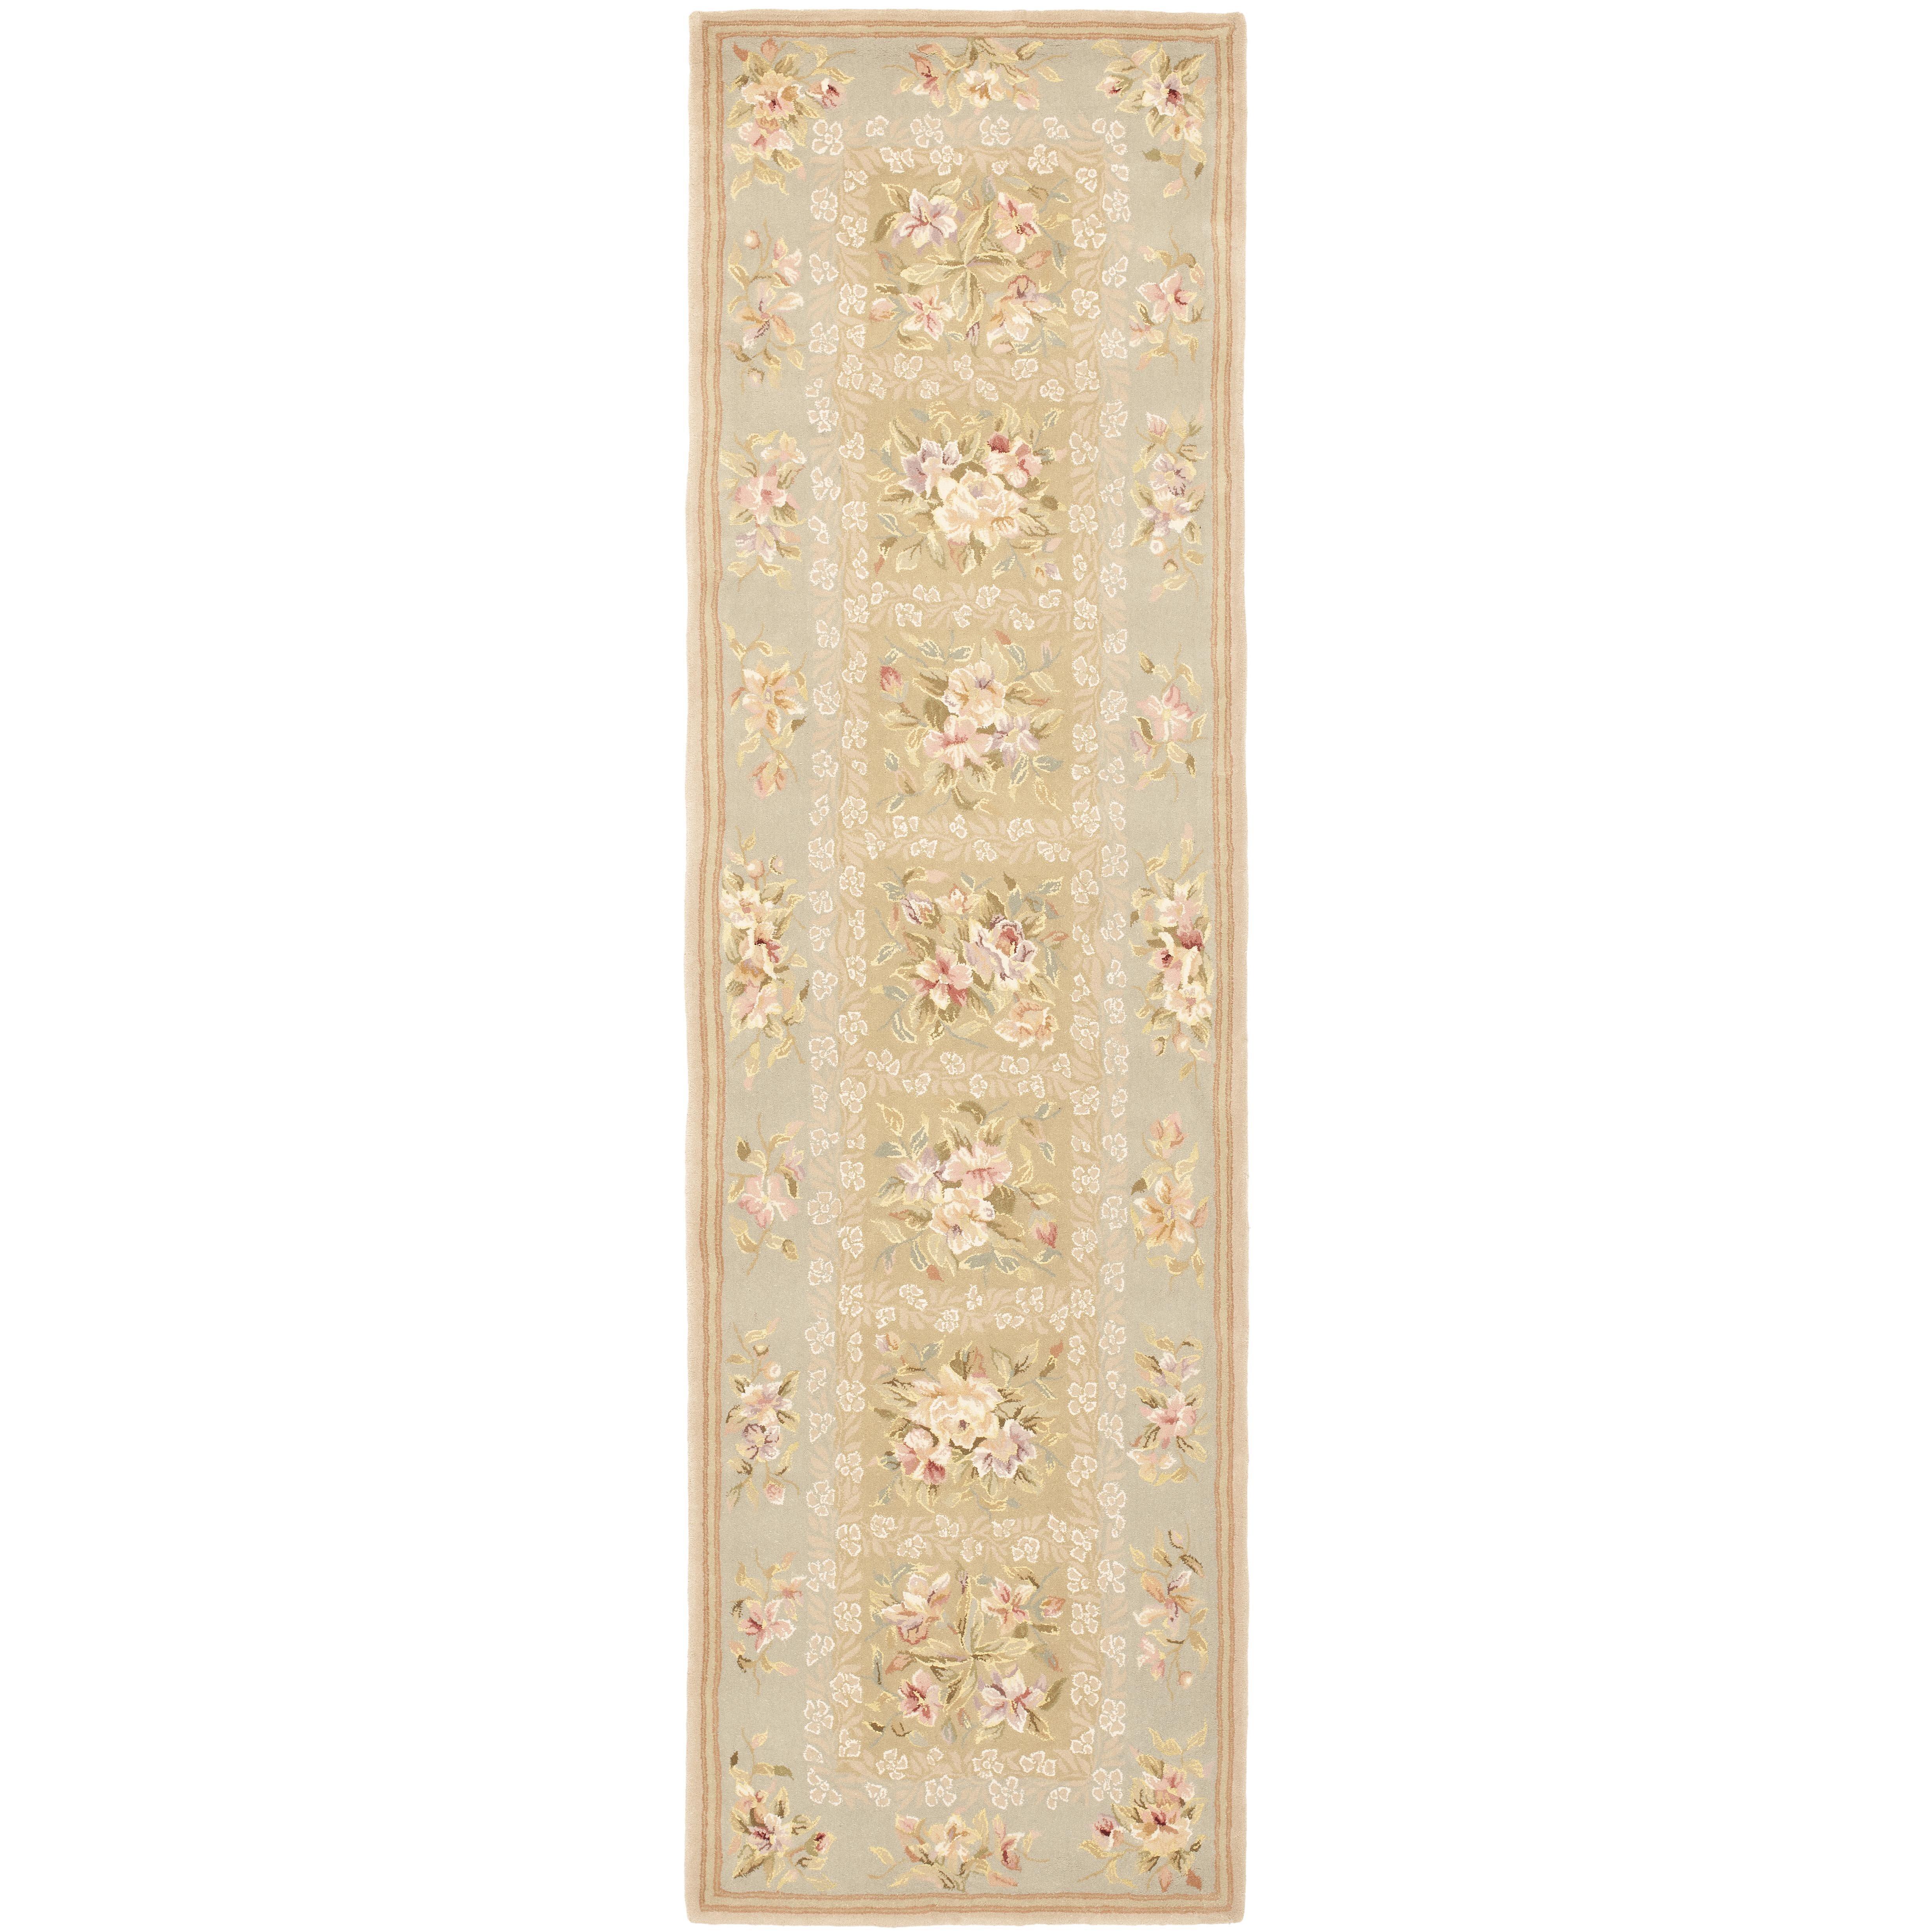 safavieh french tapis sand green floral area rug reviews. Black Bedroom Furniture Sets. Home Design Ideas